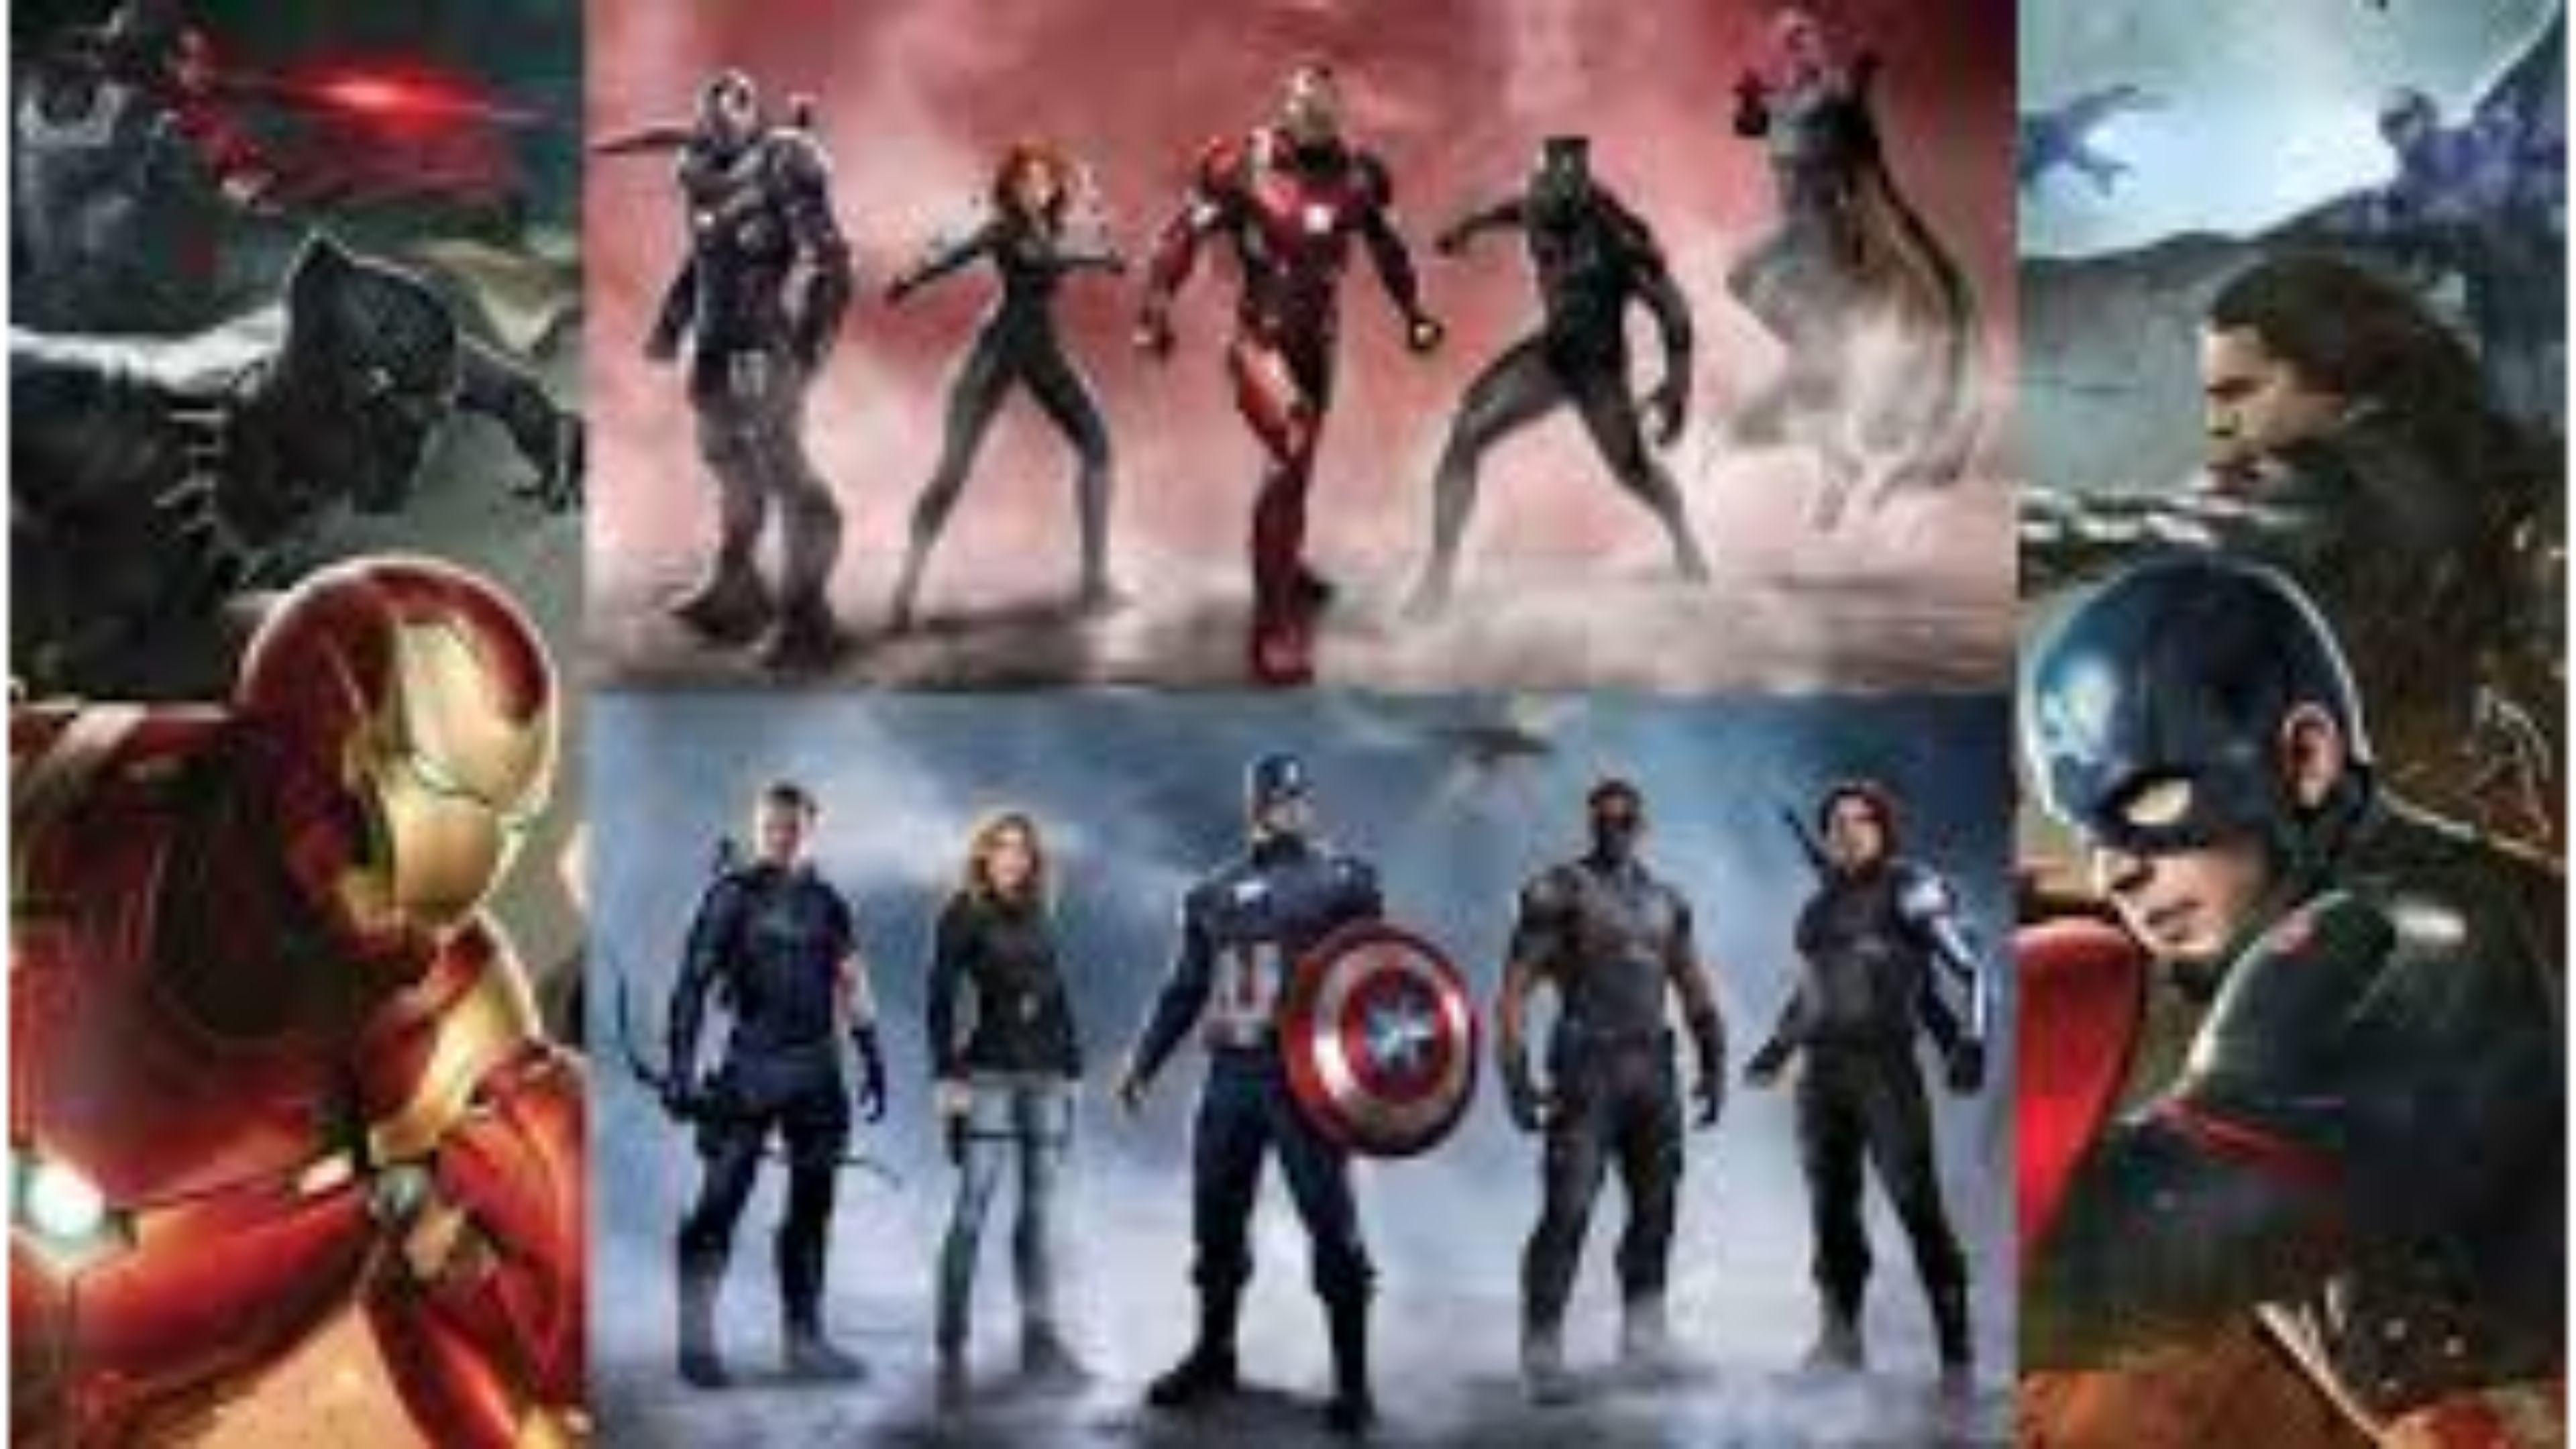 CAPTAIN AMERICA Civil War marvel superhero action fighting cacw   HD  Wallpapers   Pinterest   Captain america civil war, Civil wars and Hd  wallpaper